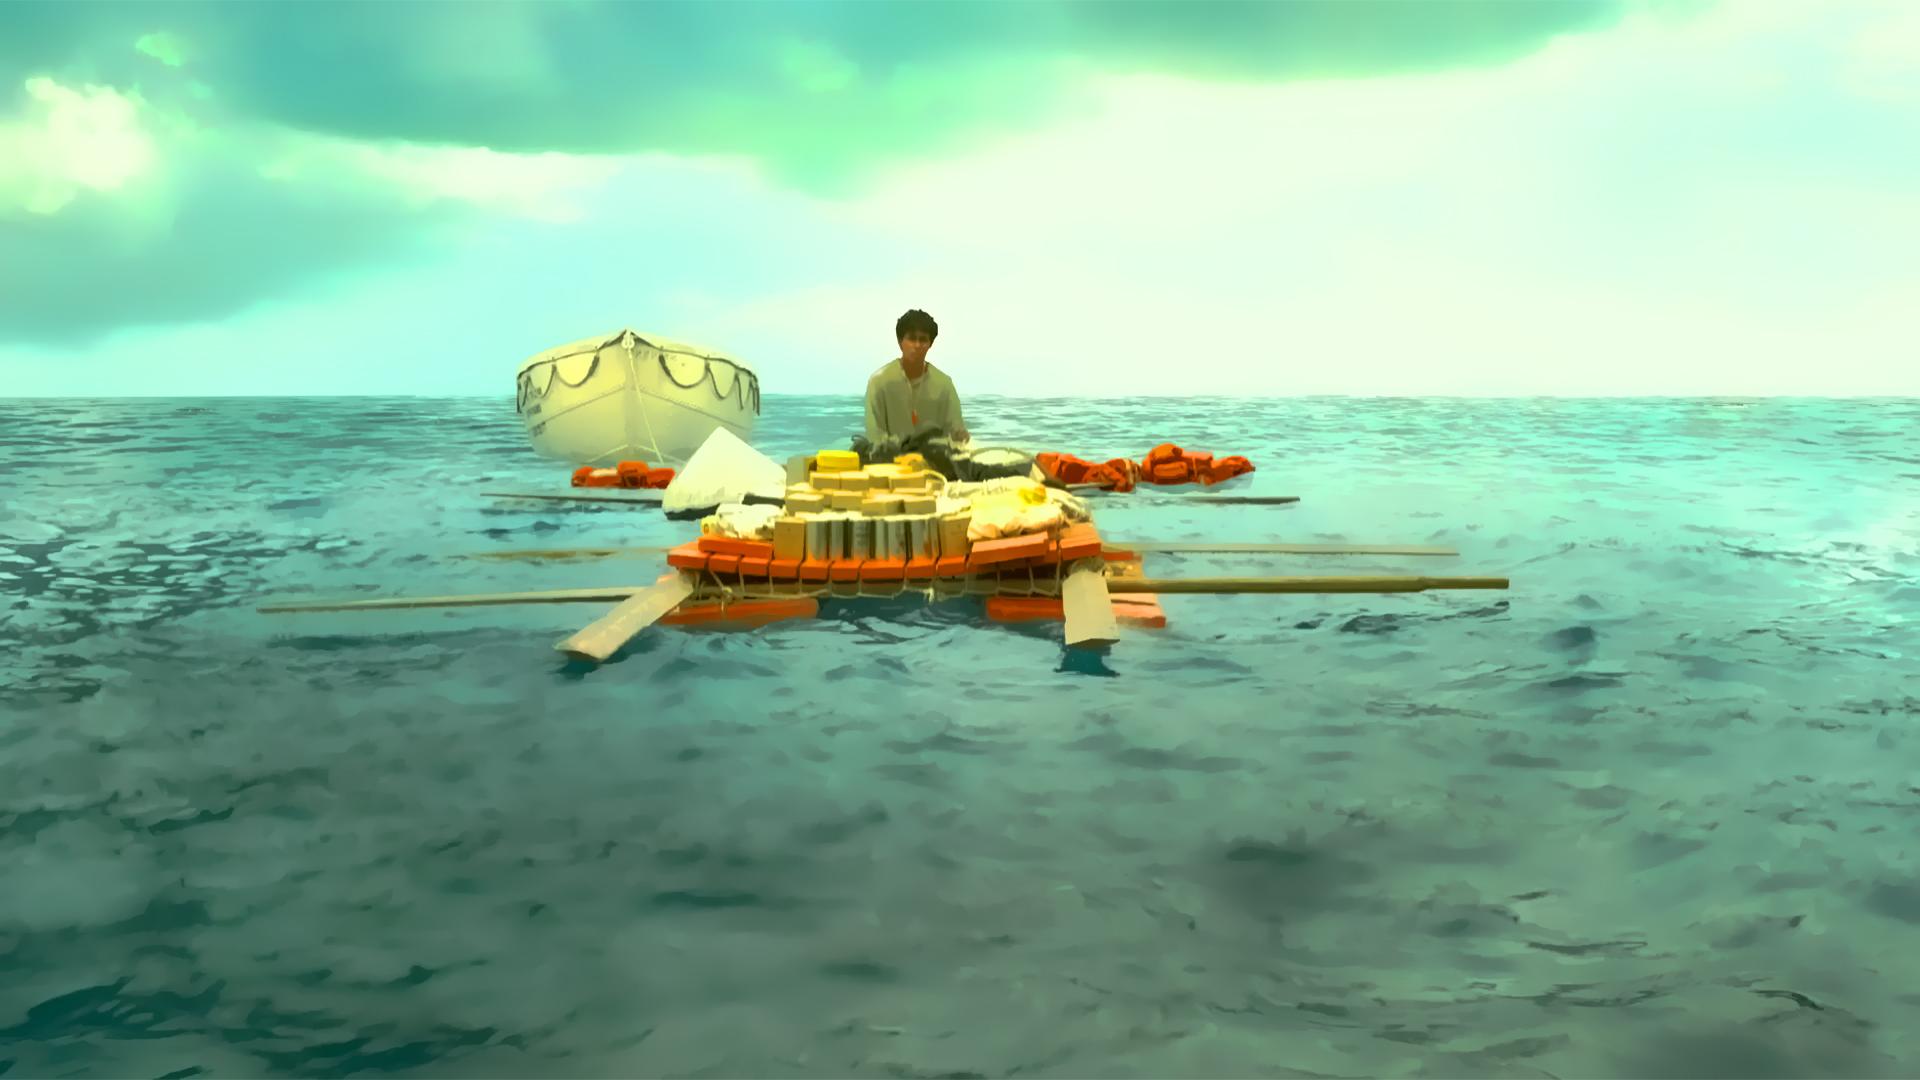 Raft Ocean HD wallpaper 1920x1080